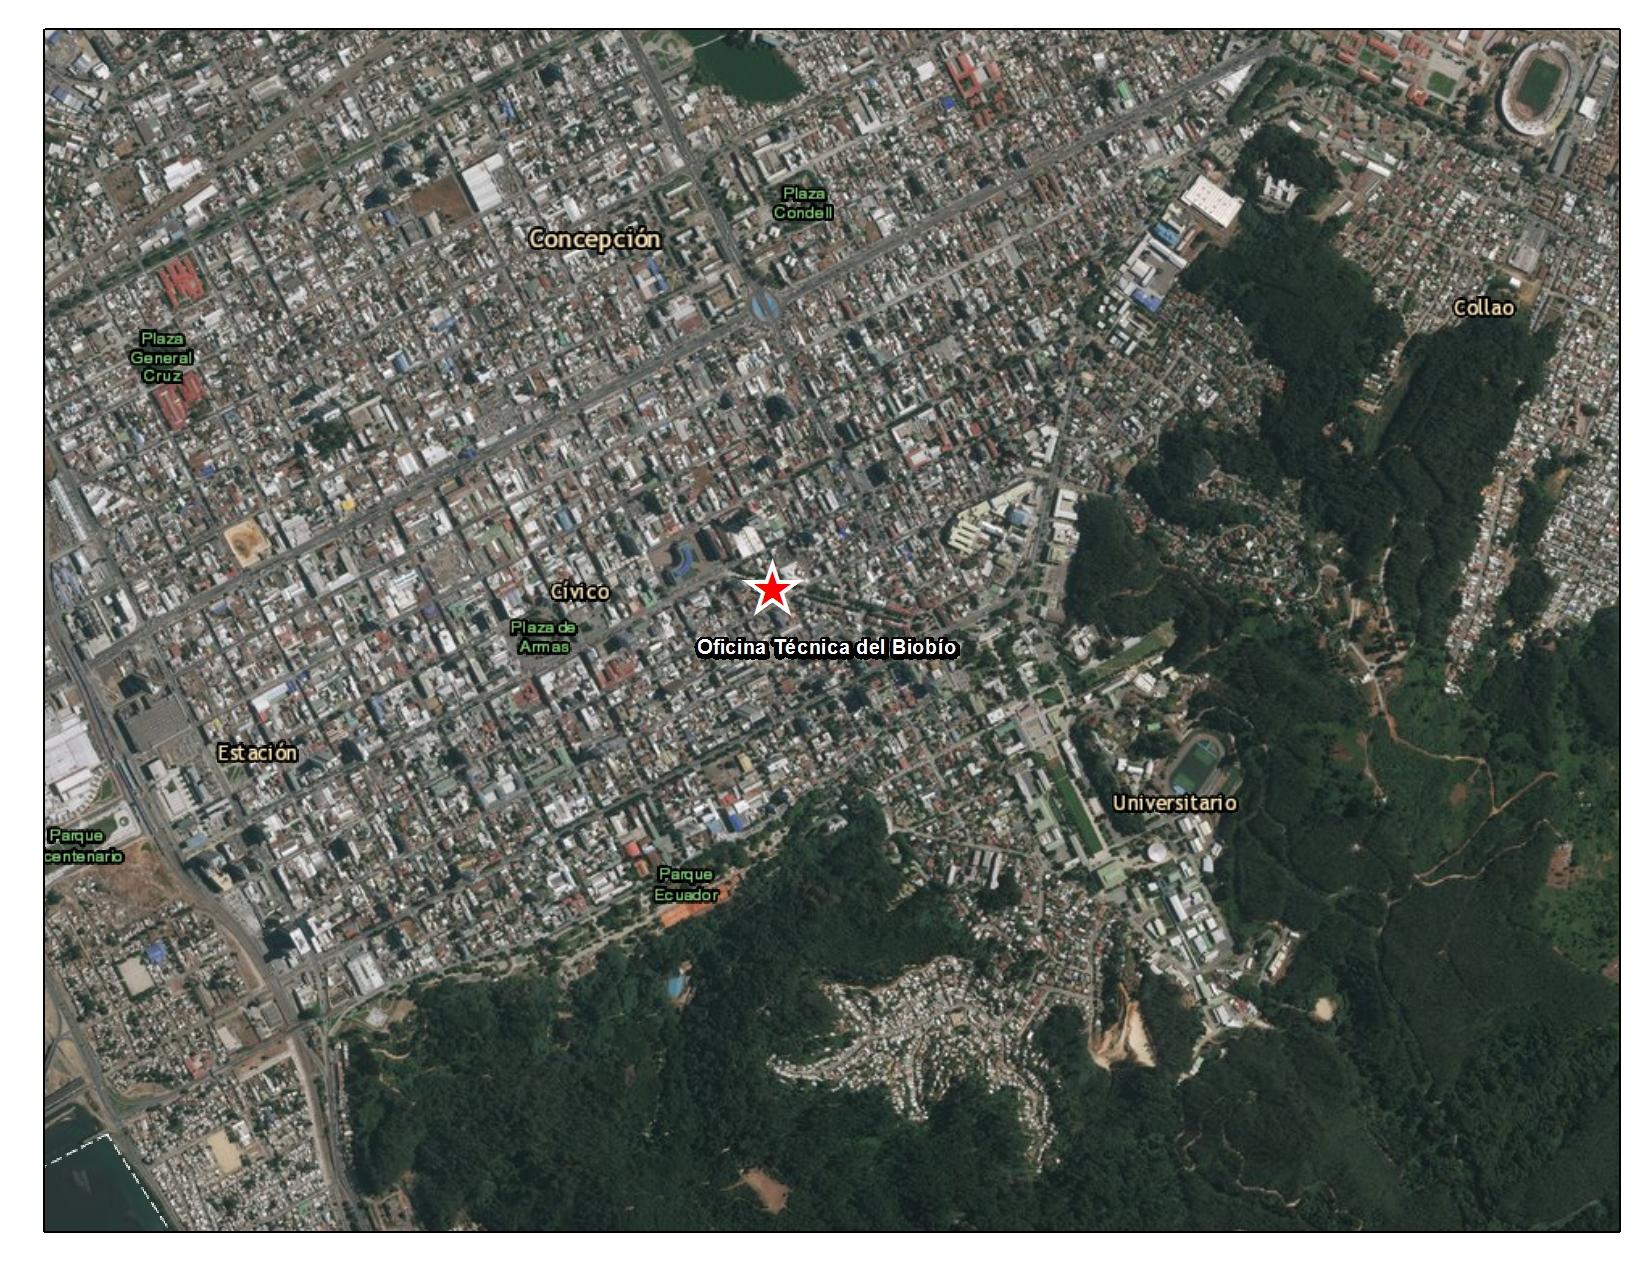 Imagen de Oficina técnica regional del Biobío